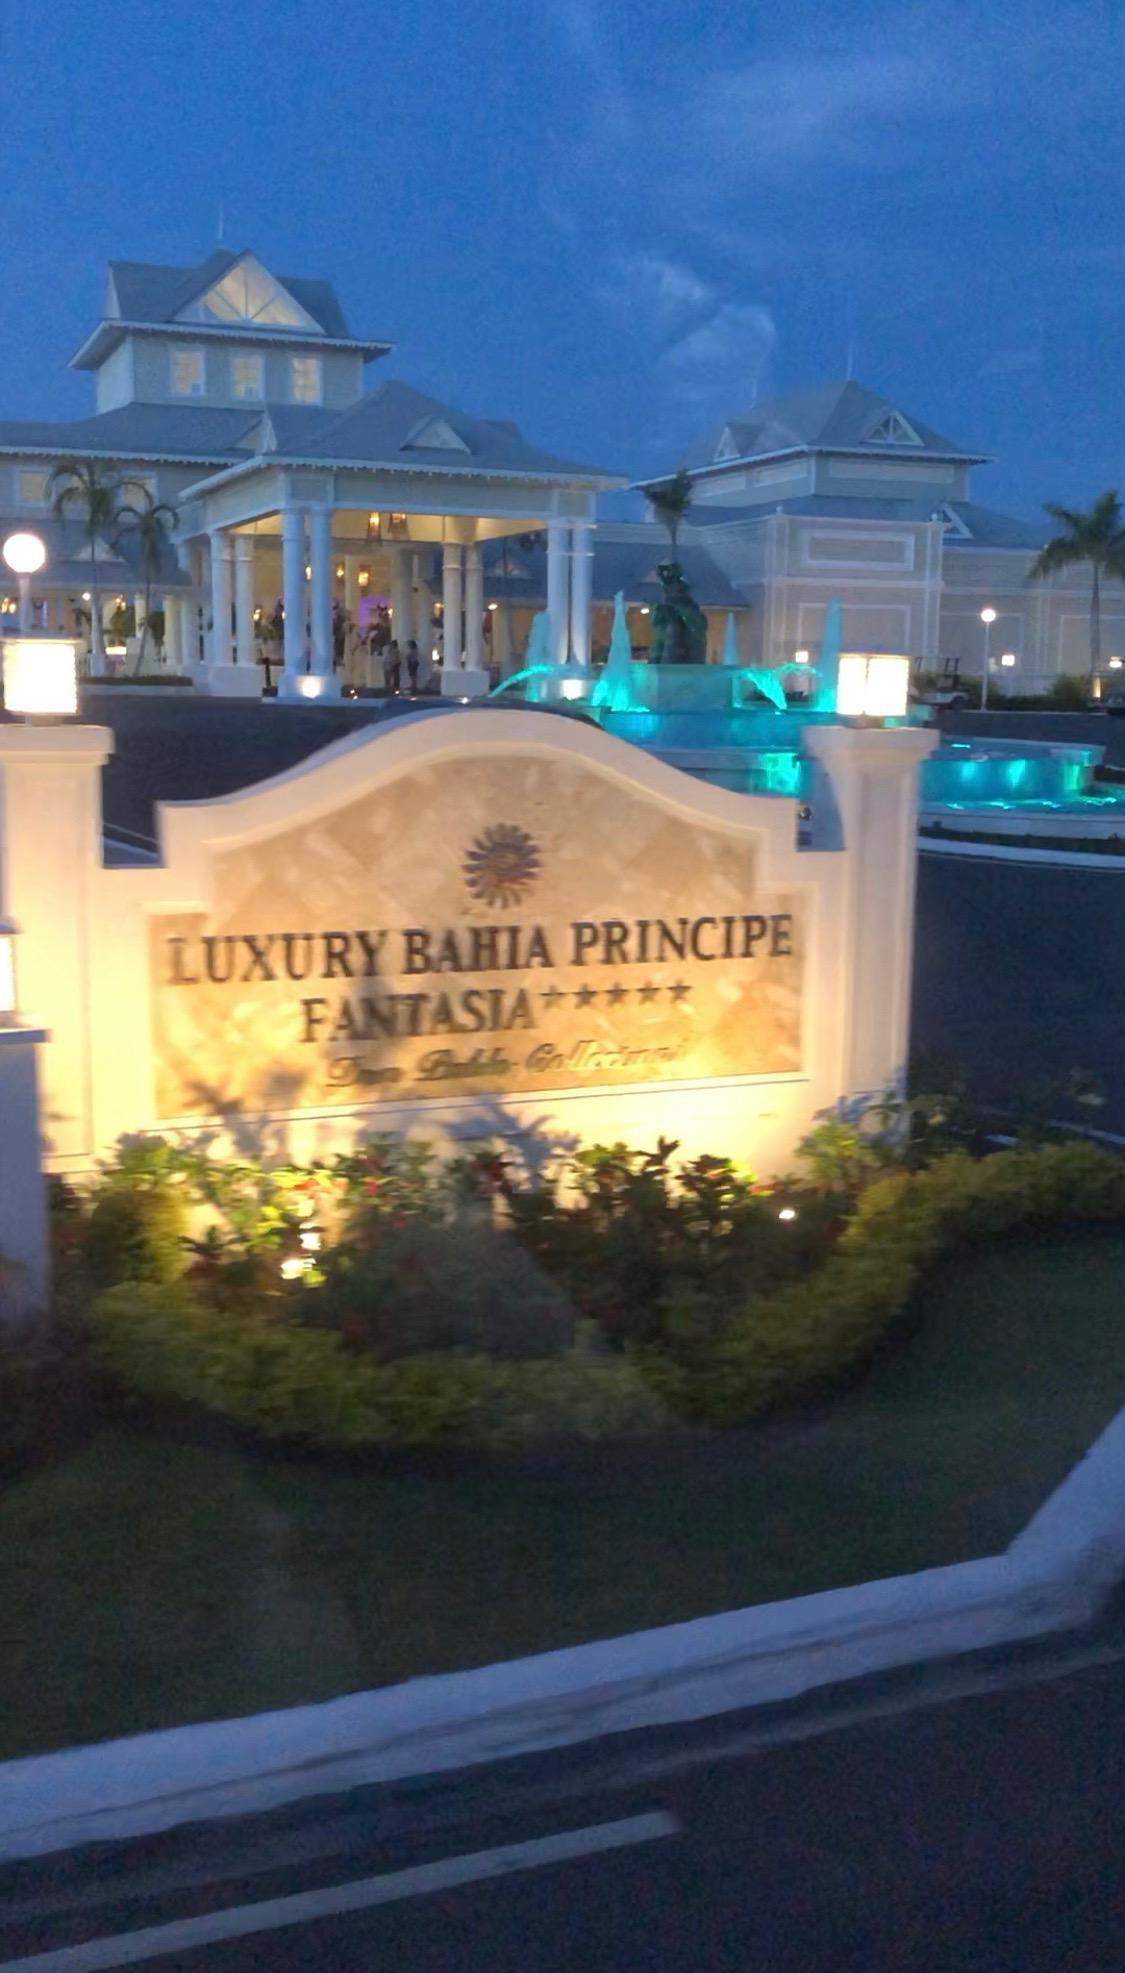 Entering the Luxury Bahia Principe lobby.